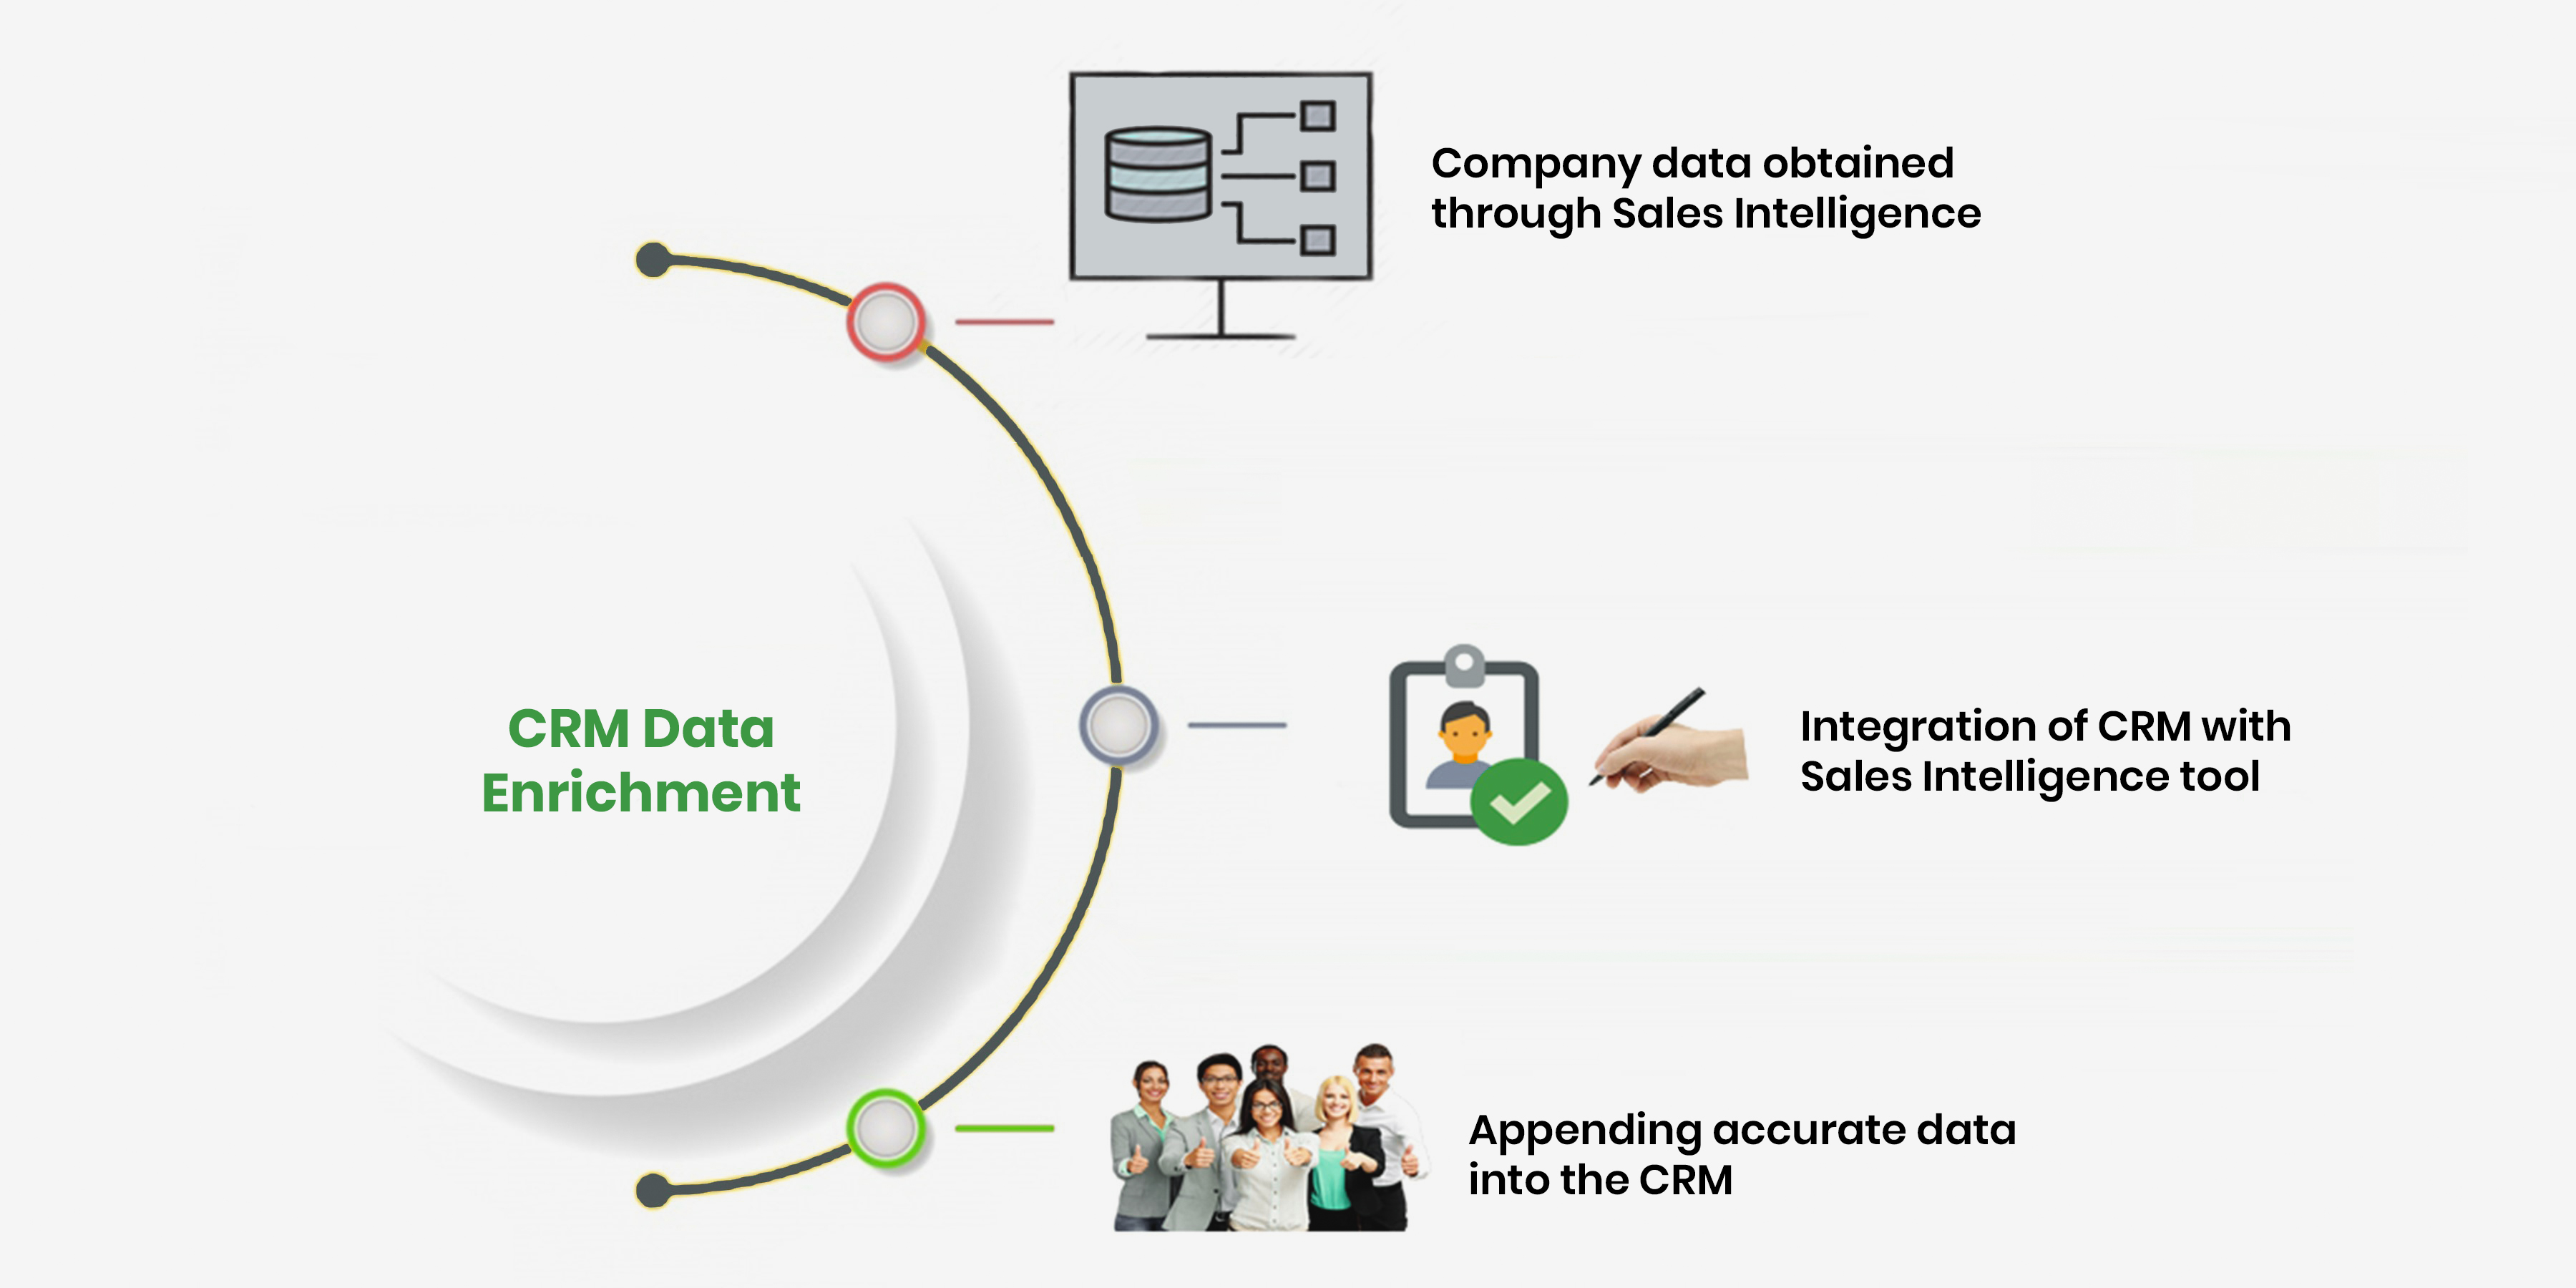 CRM Data